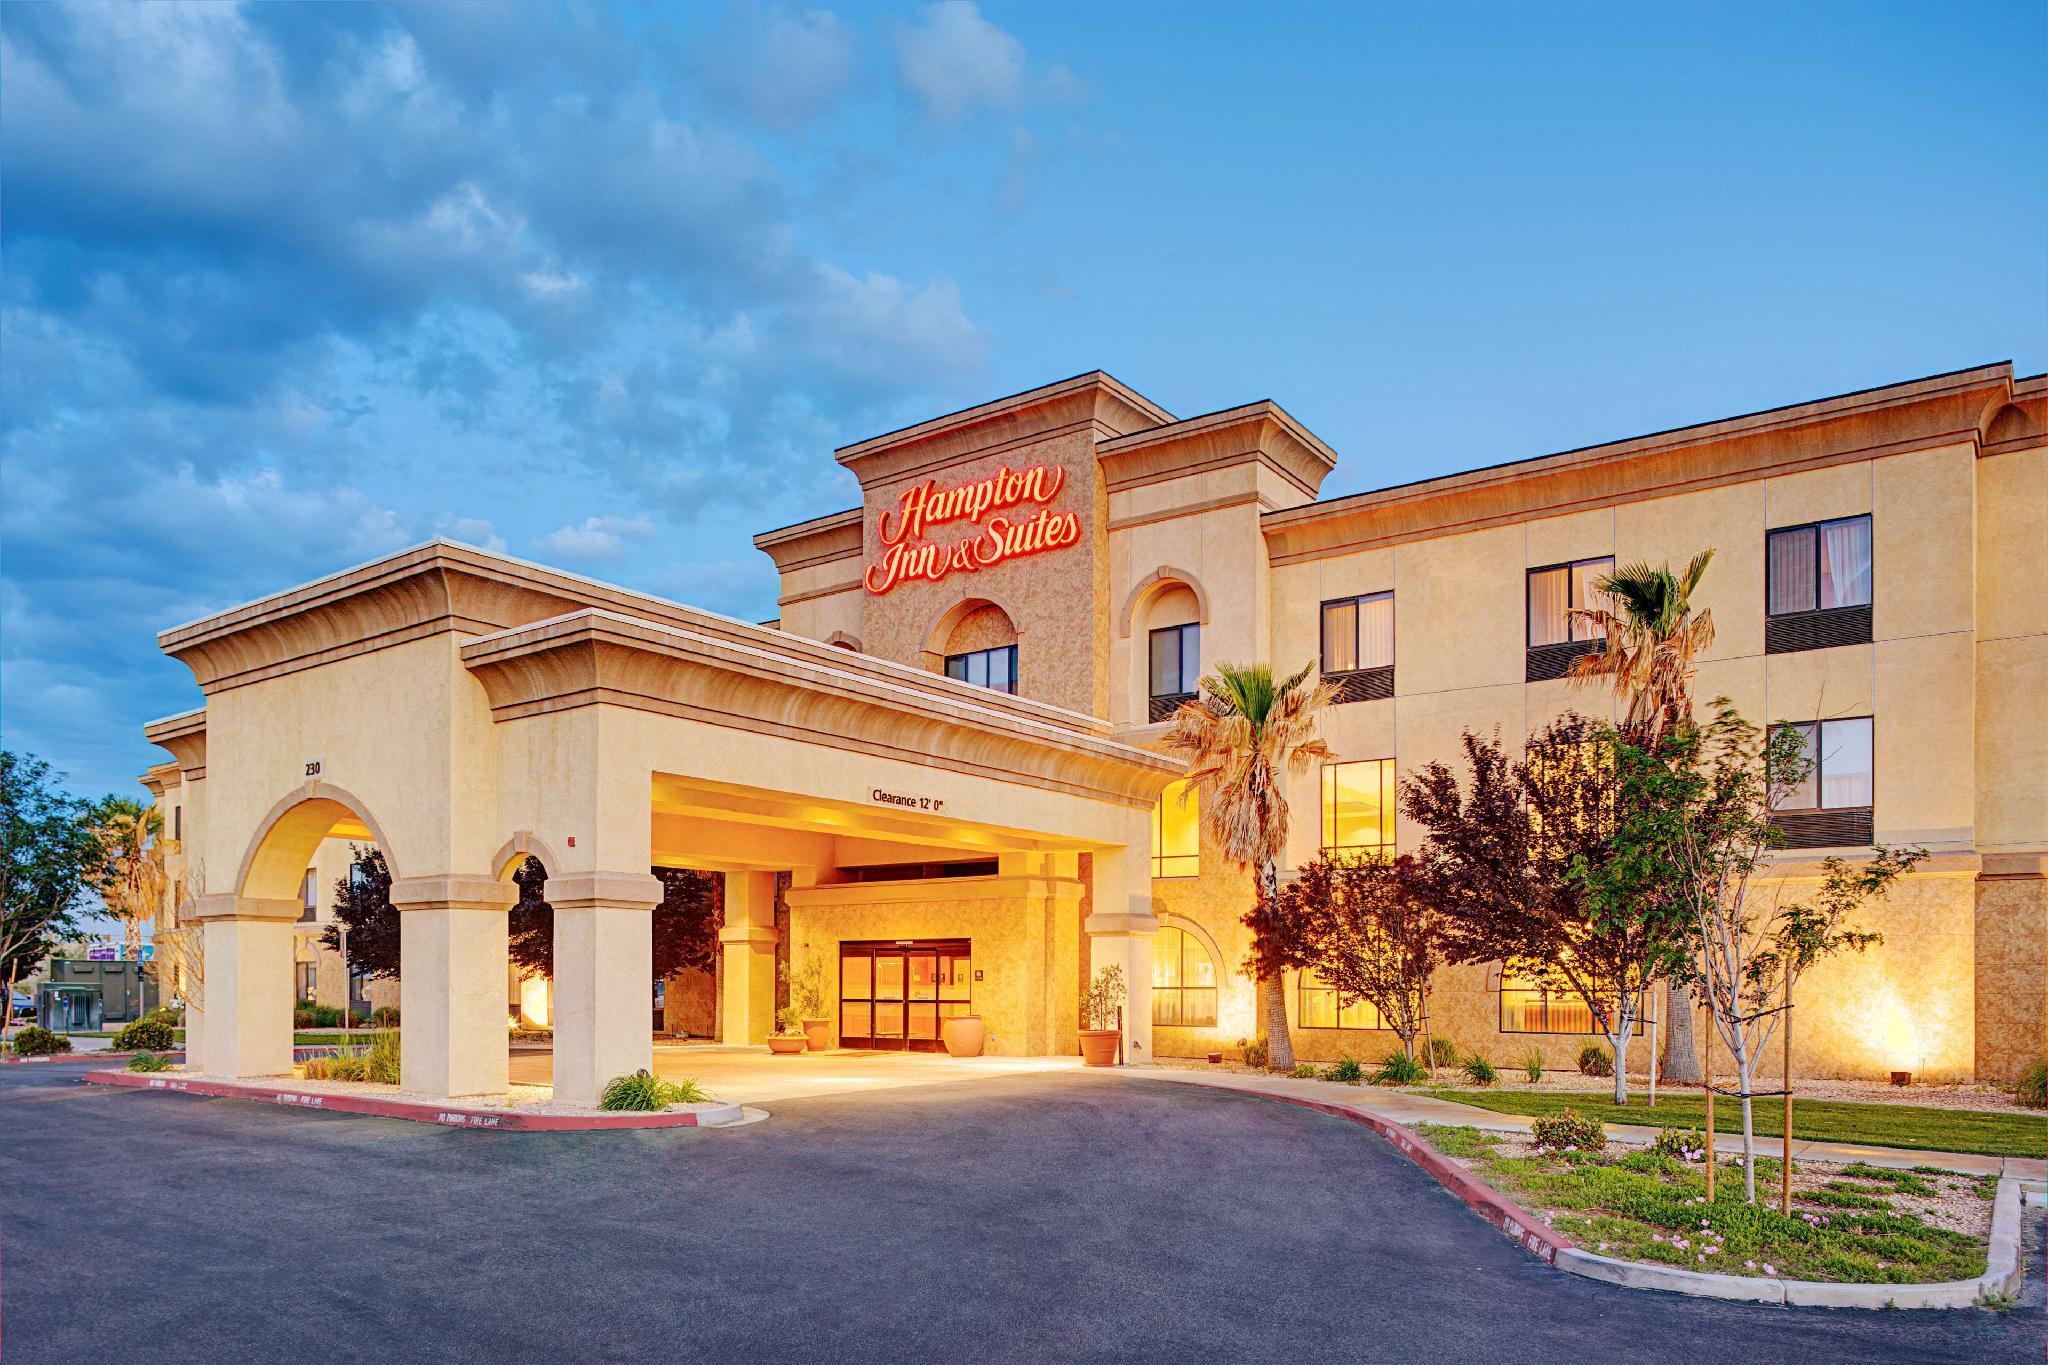 Hampton Inn Suites Lancaster